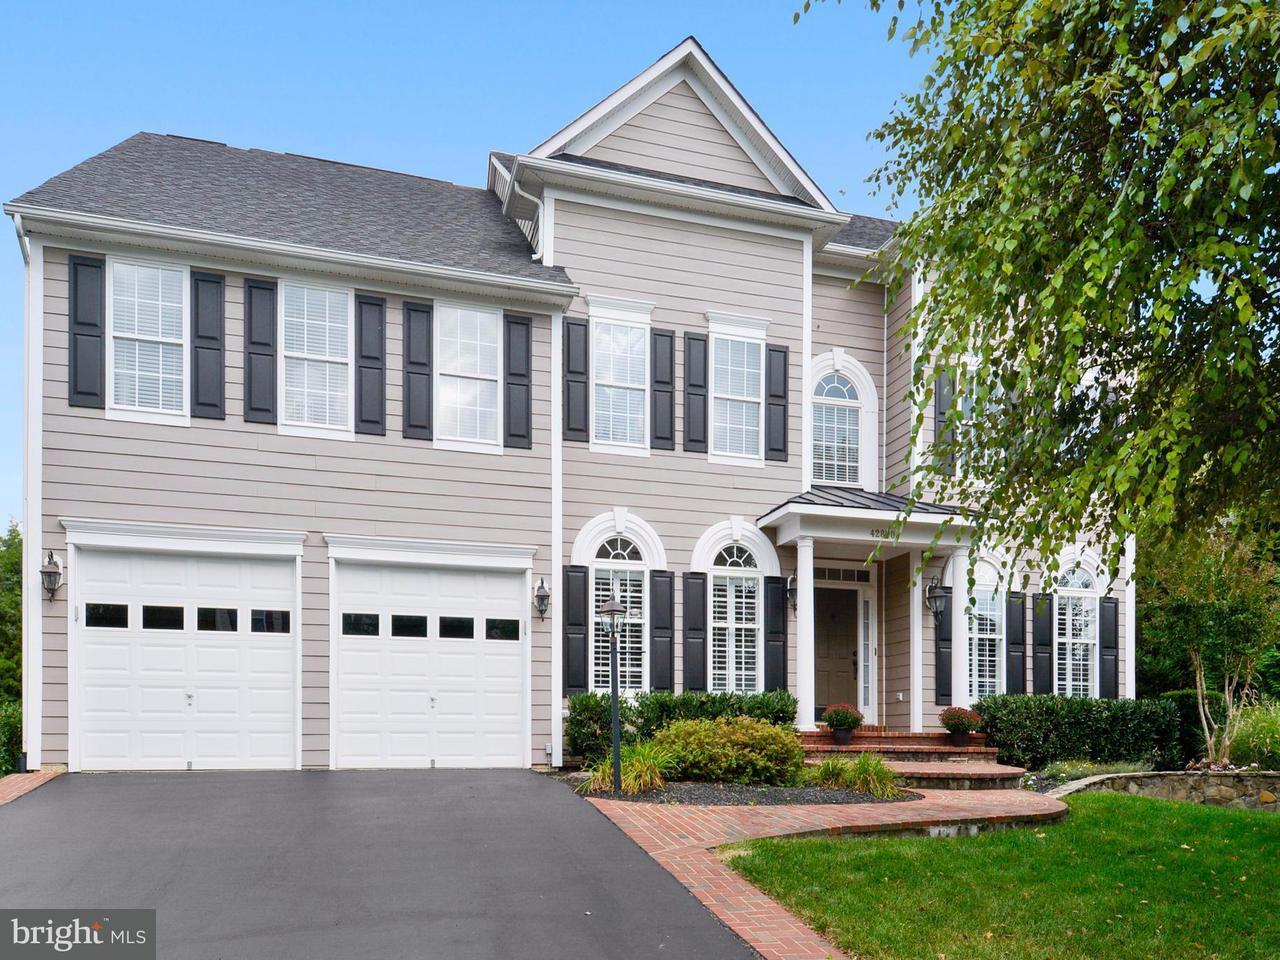 独户住宅 为 销售 在 42870 GLYNDEBOURNE Court 42870 GLYNDEBOURNE Court Broadlands, 弗吉尼亚州 20148 美国